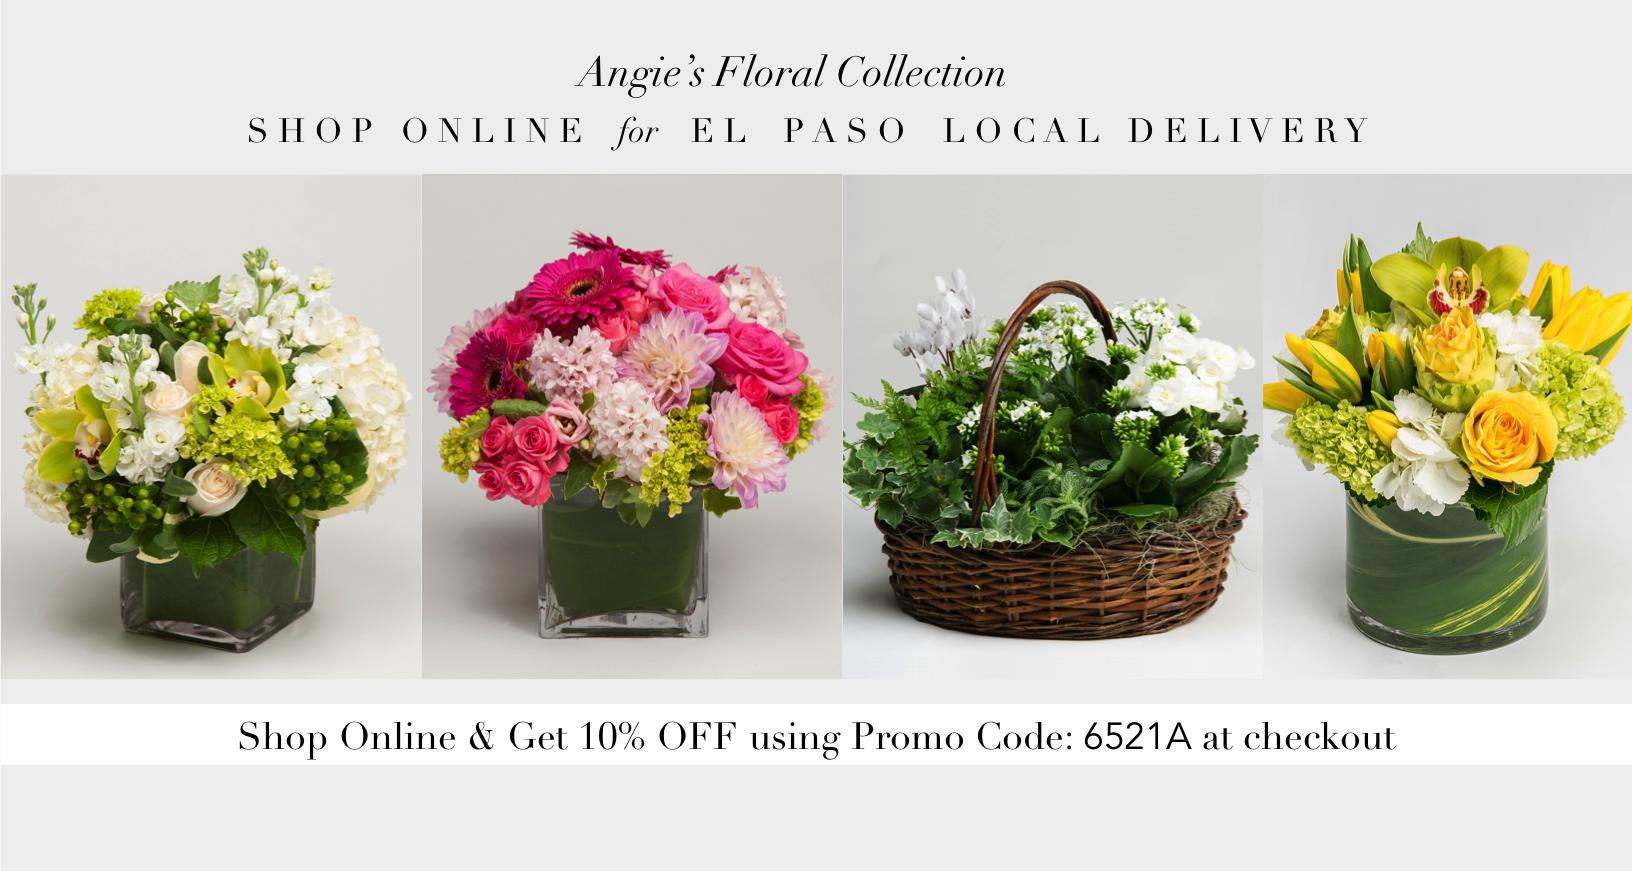 05-angies-floral-designs-el-paso-florist-el-paso-texas-fall-flowers-shop-online-el-paso-florist-floreria-floral-designs-.png